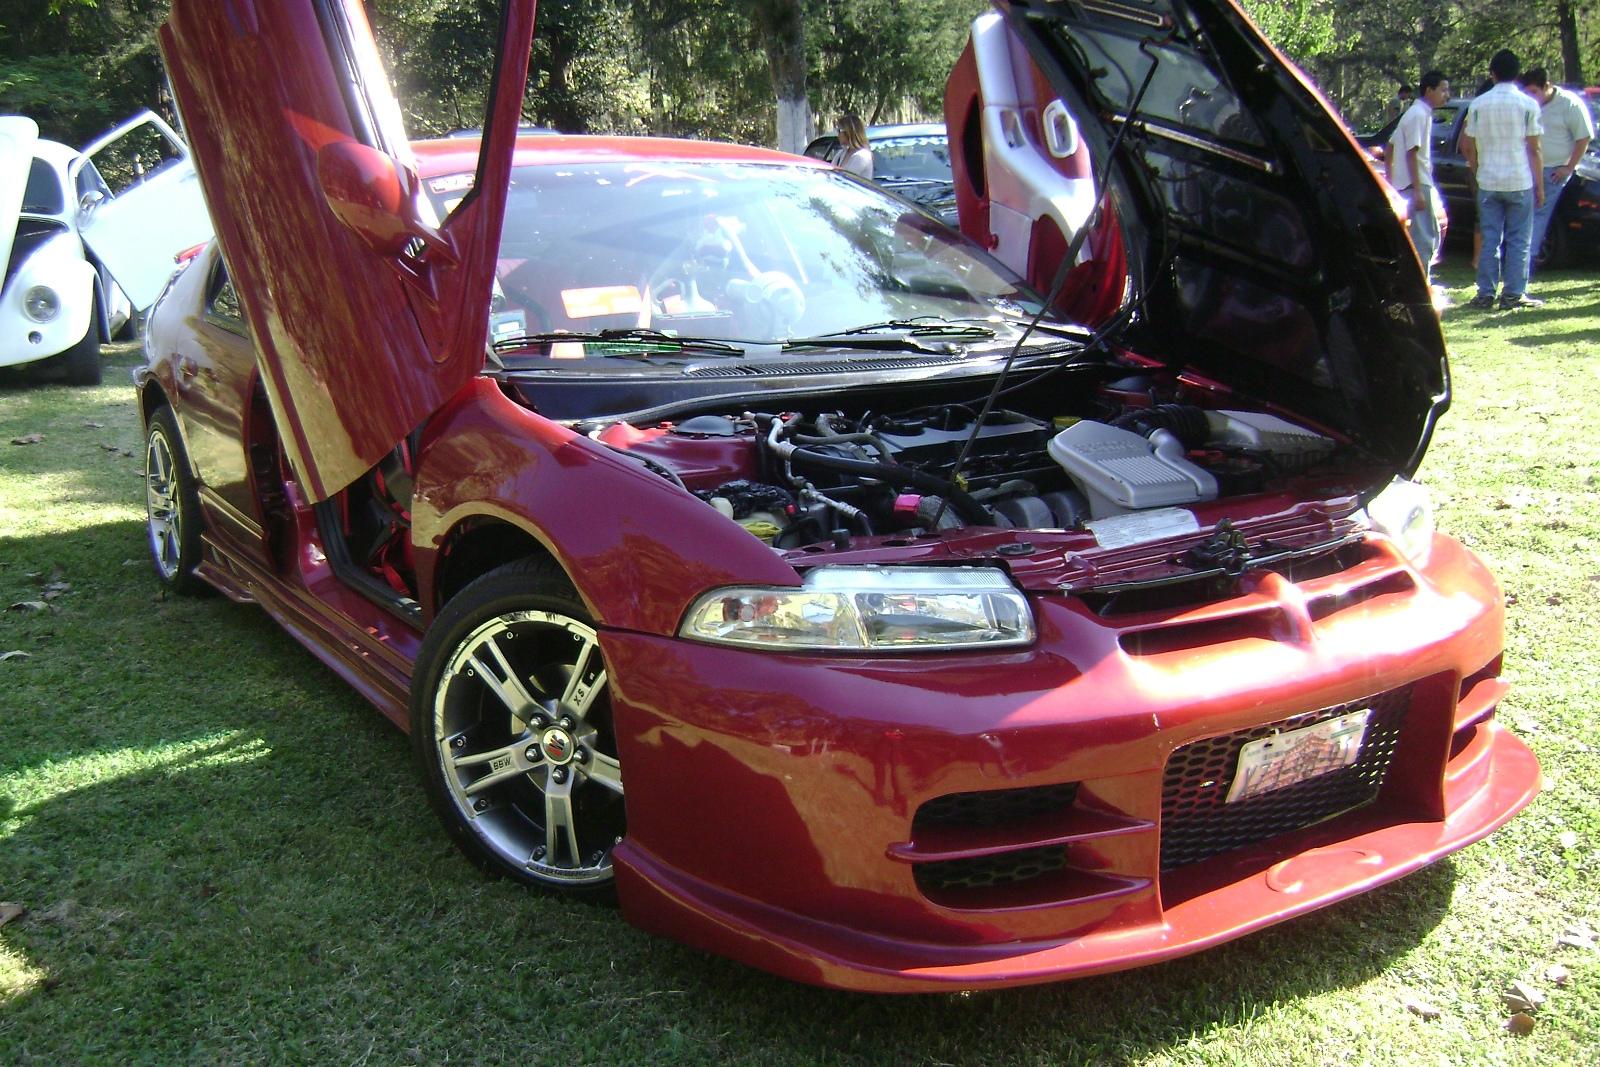 97 Chrysler Cirrus Engine Diagramon 2003 Ford Expedition Egr Valve Location